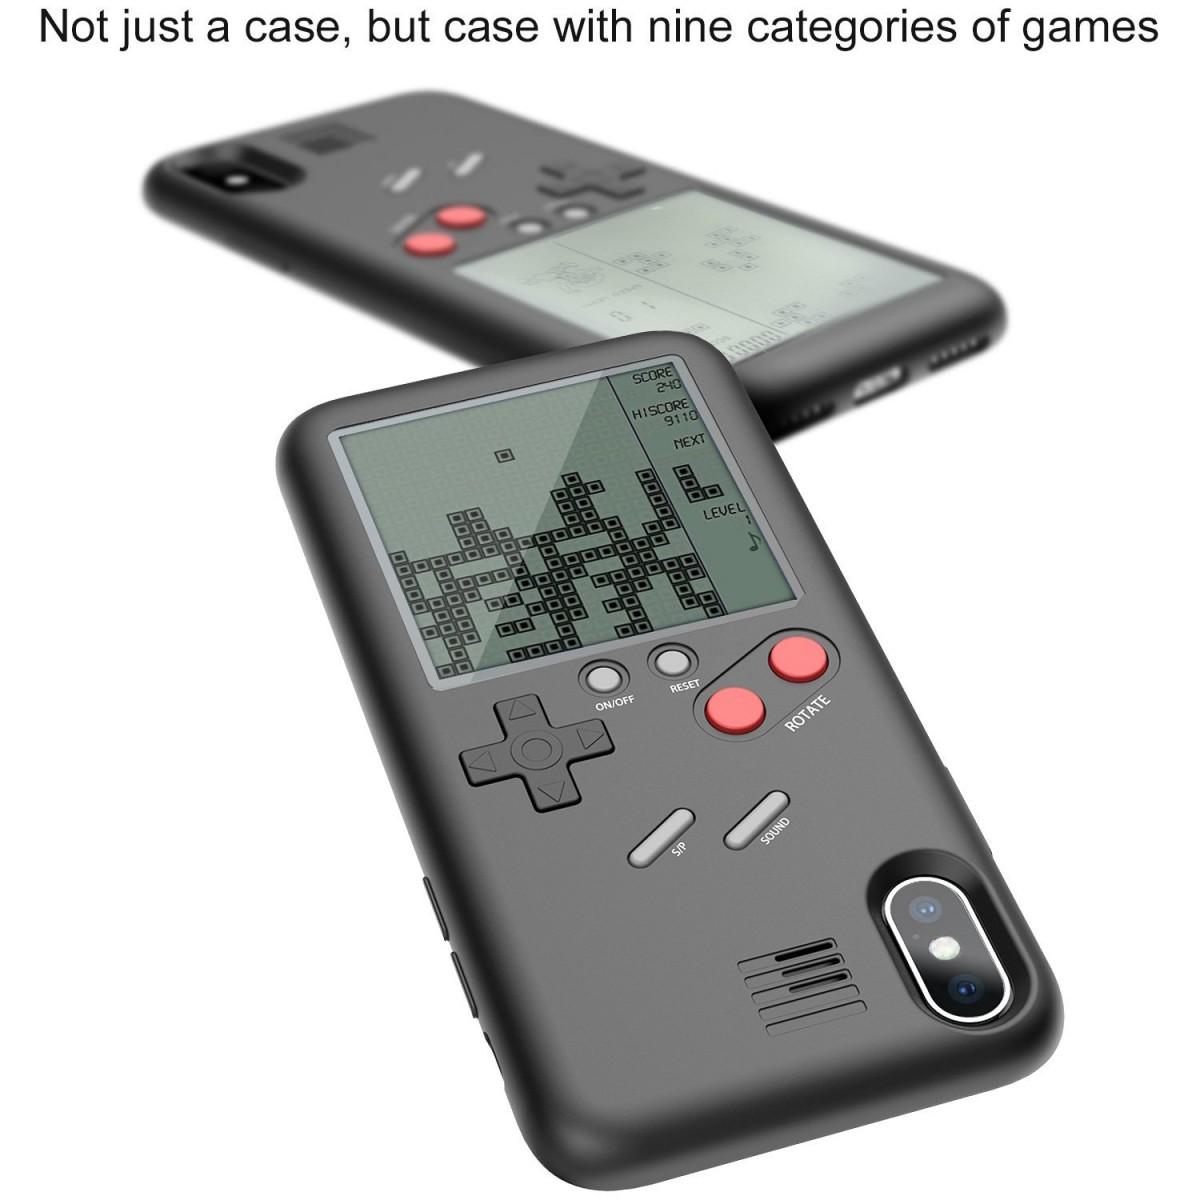 Pouzdro Wanle Gamers Console Apple iPhone X Černé s konzolí